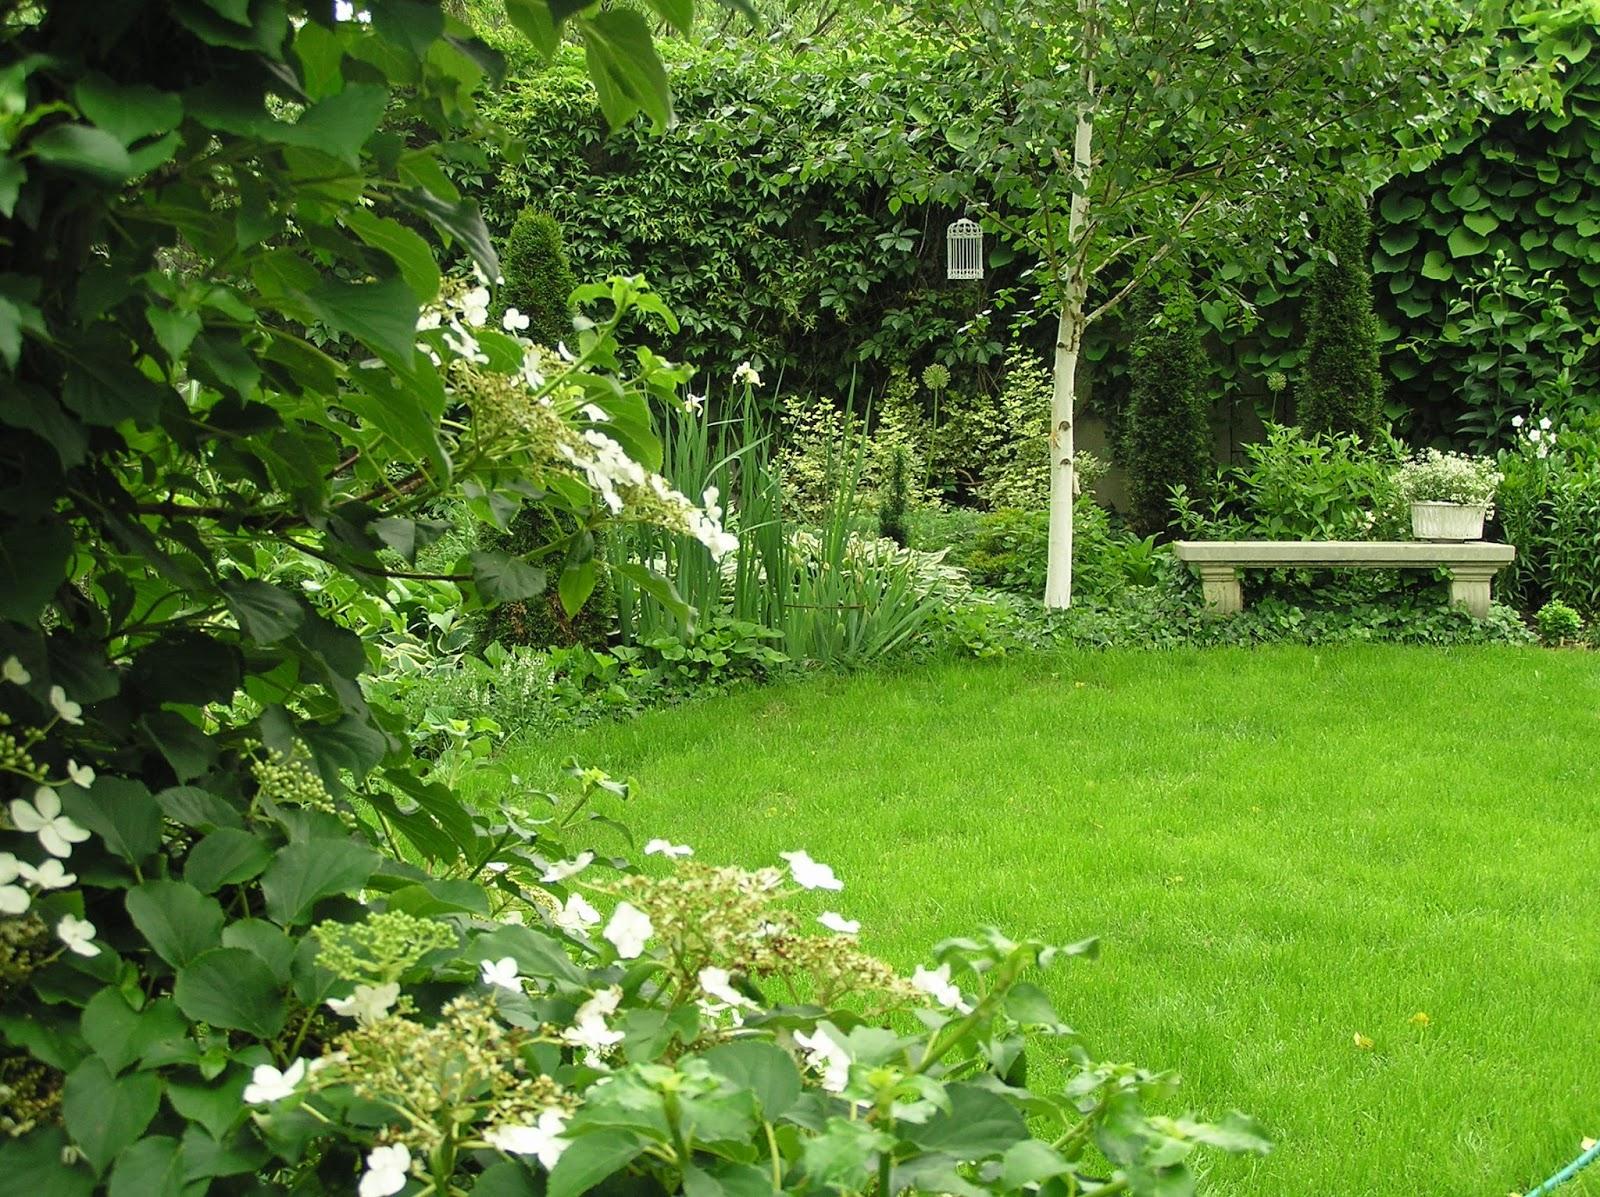 Ogród Tamaryszka: BIAŁY OGRÓD